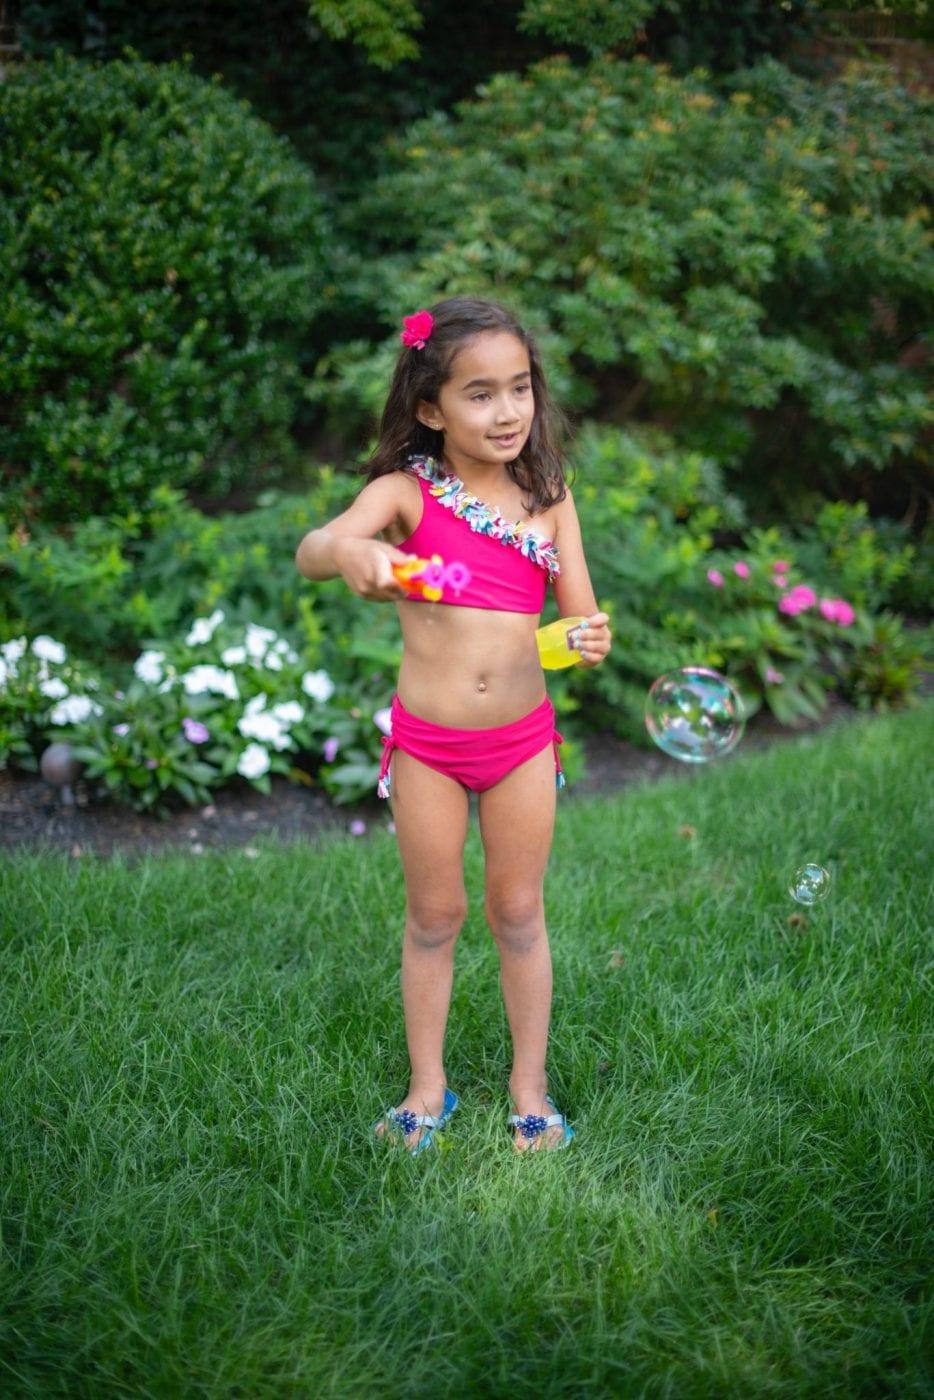 summersalt bathing suits